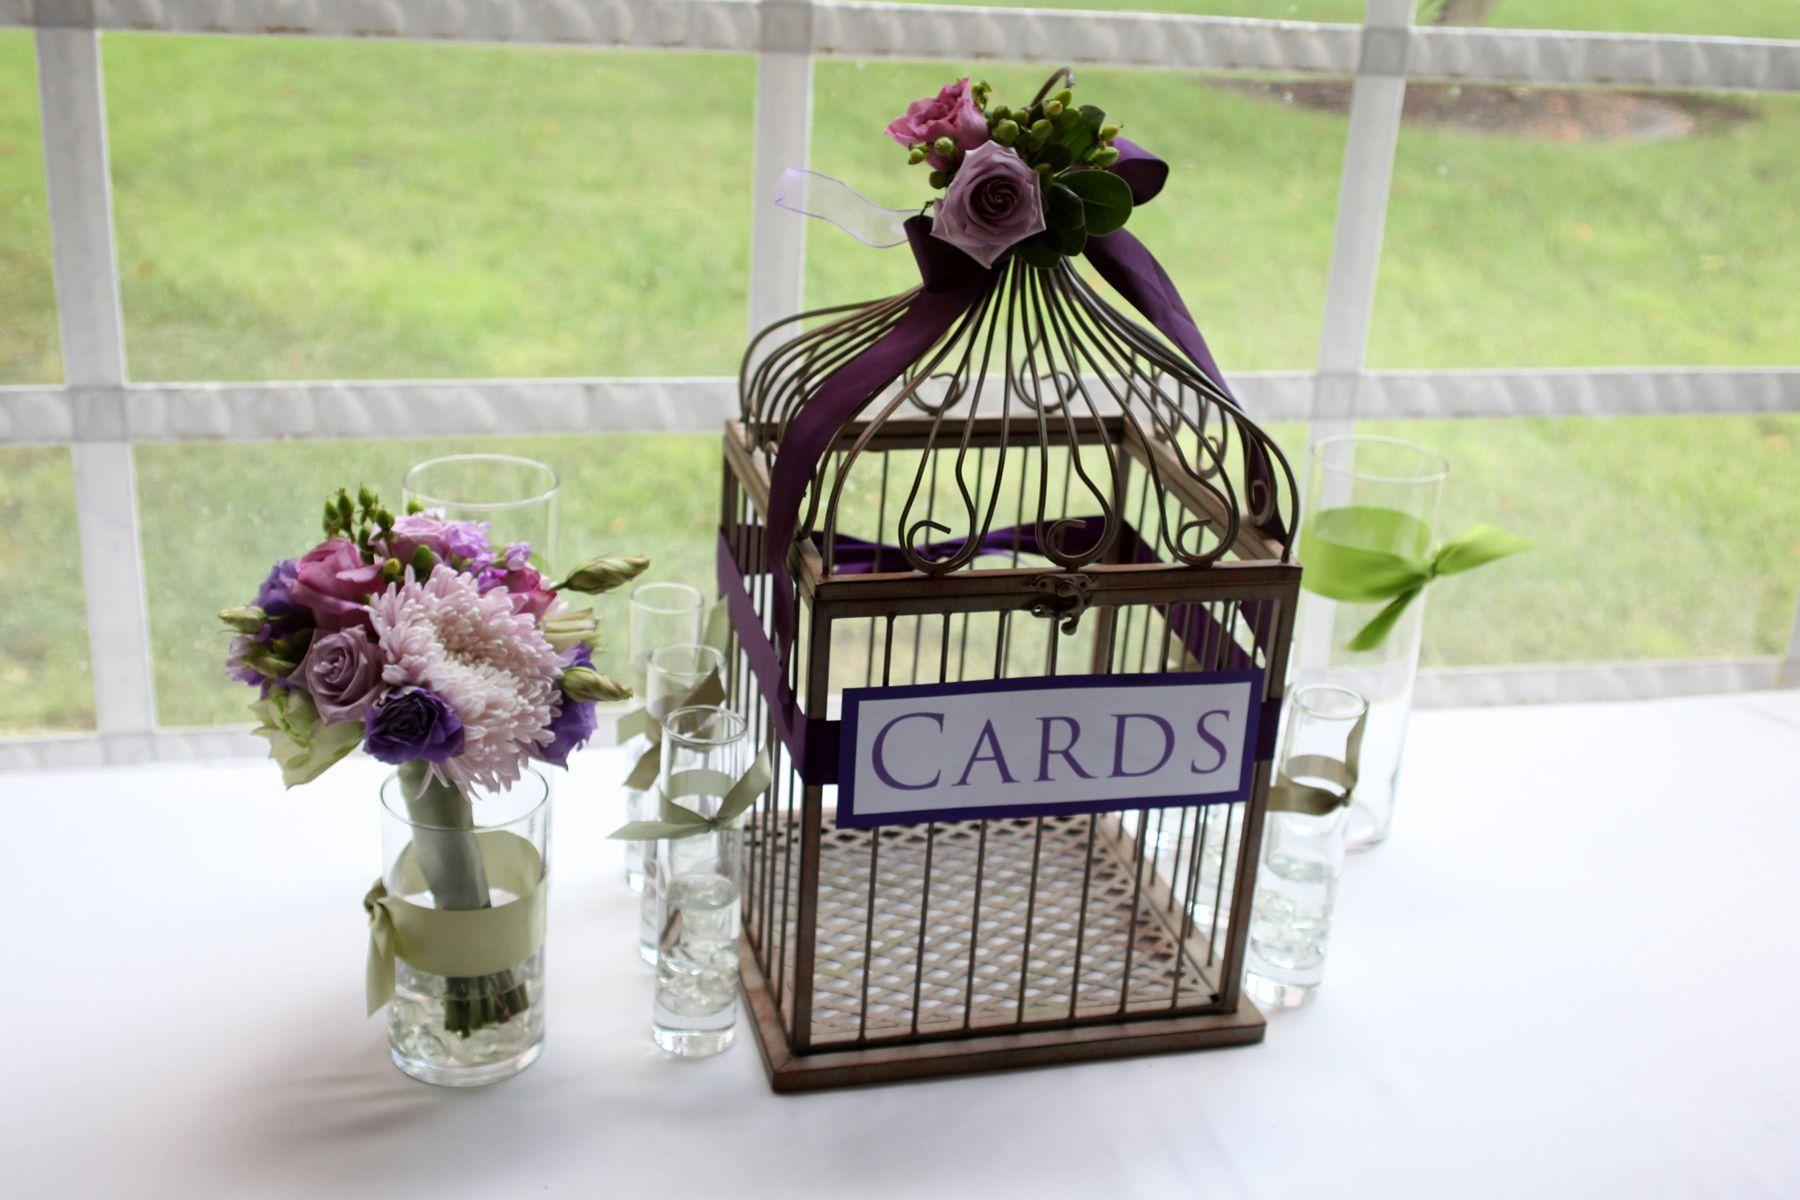 Creative Wedding Card Holders | Wedding card holder, Card ...